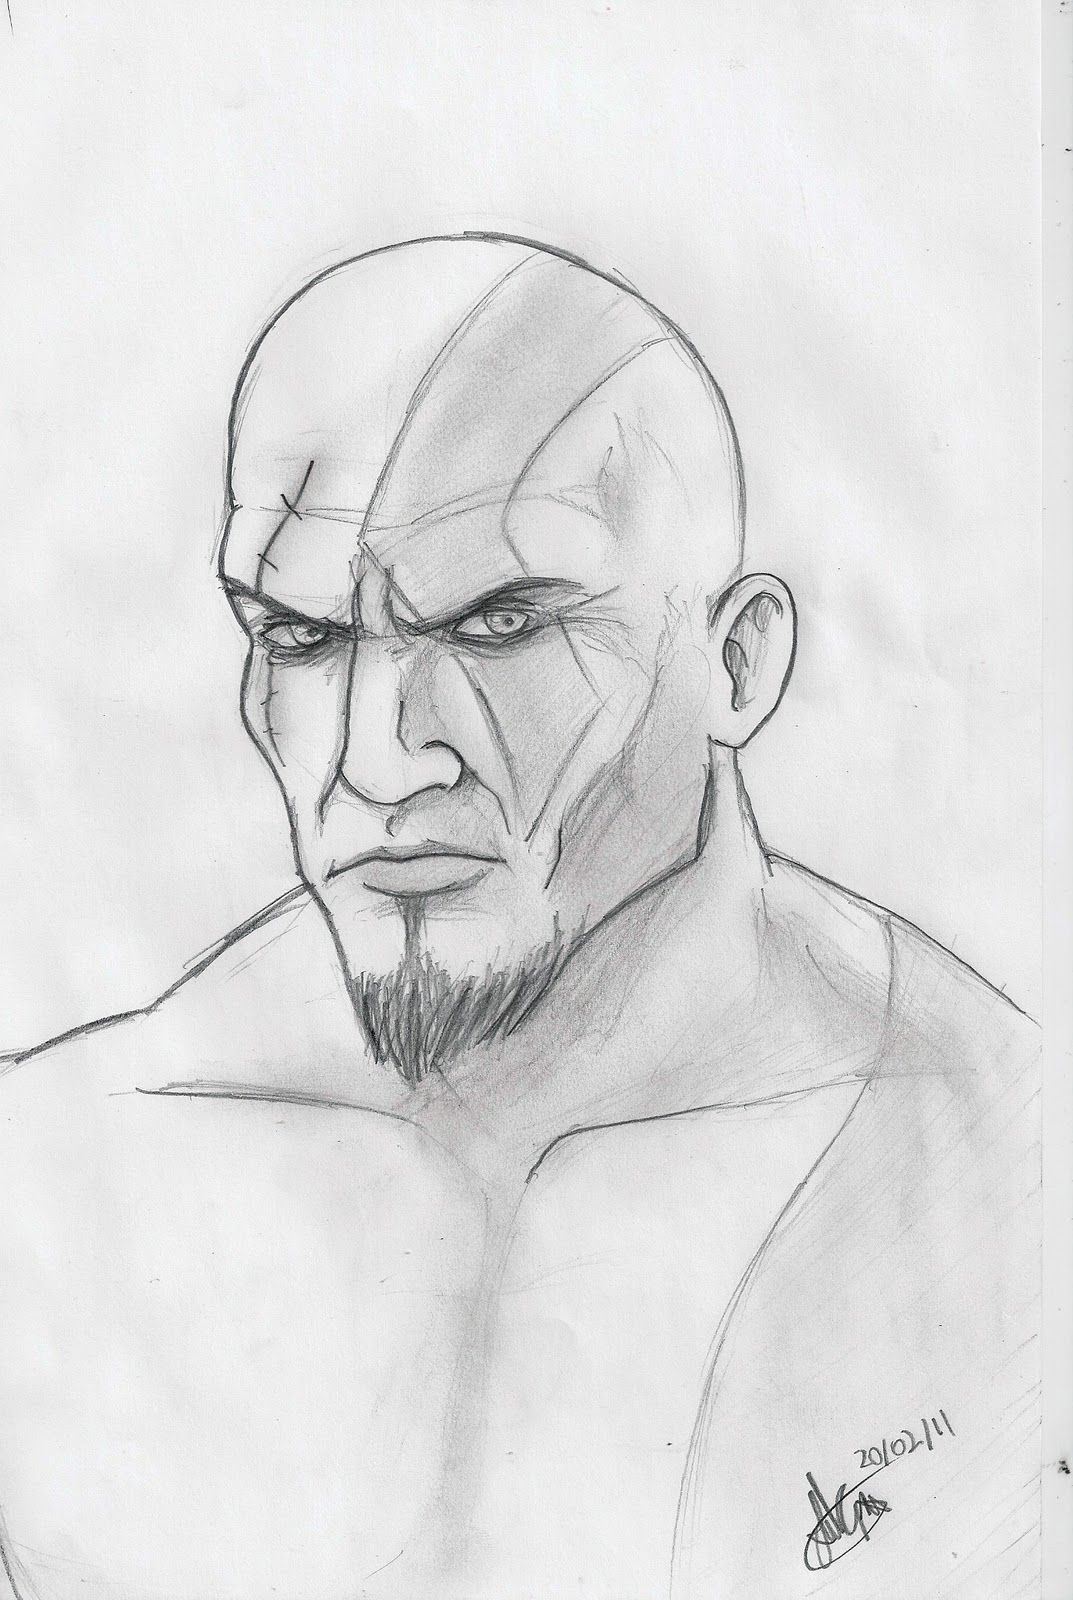 Colorir kratos god of war drawing sketches playstation character design drawing art